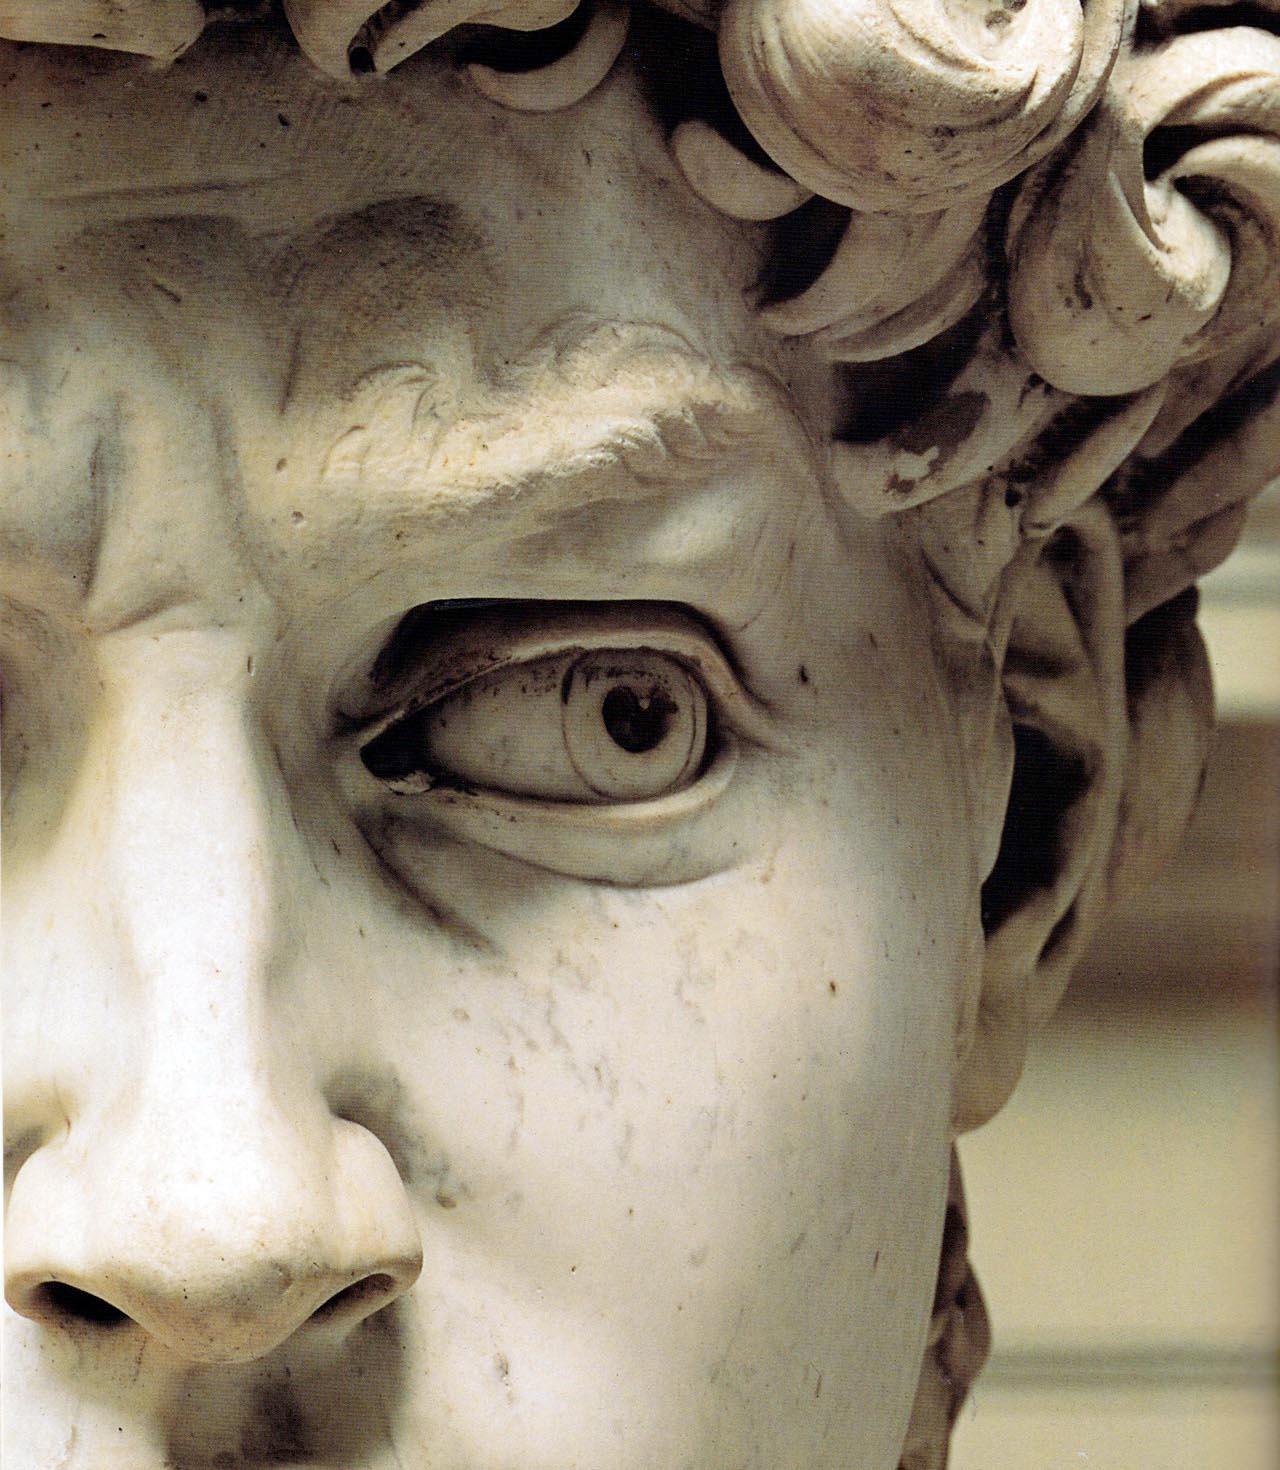 michelangelo-david-detail-face